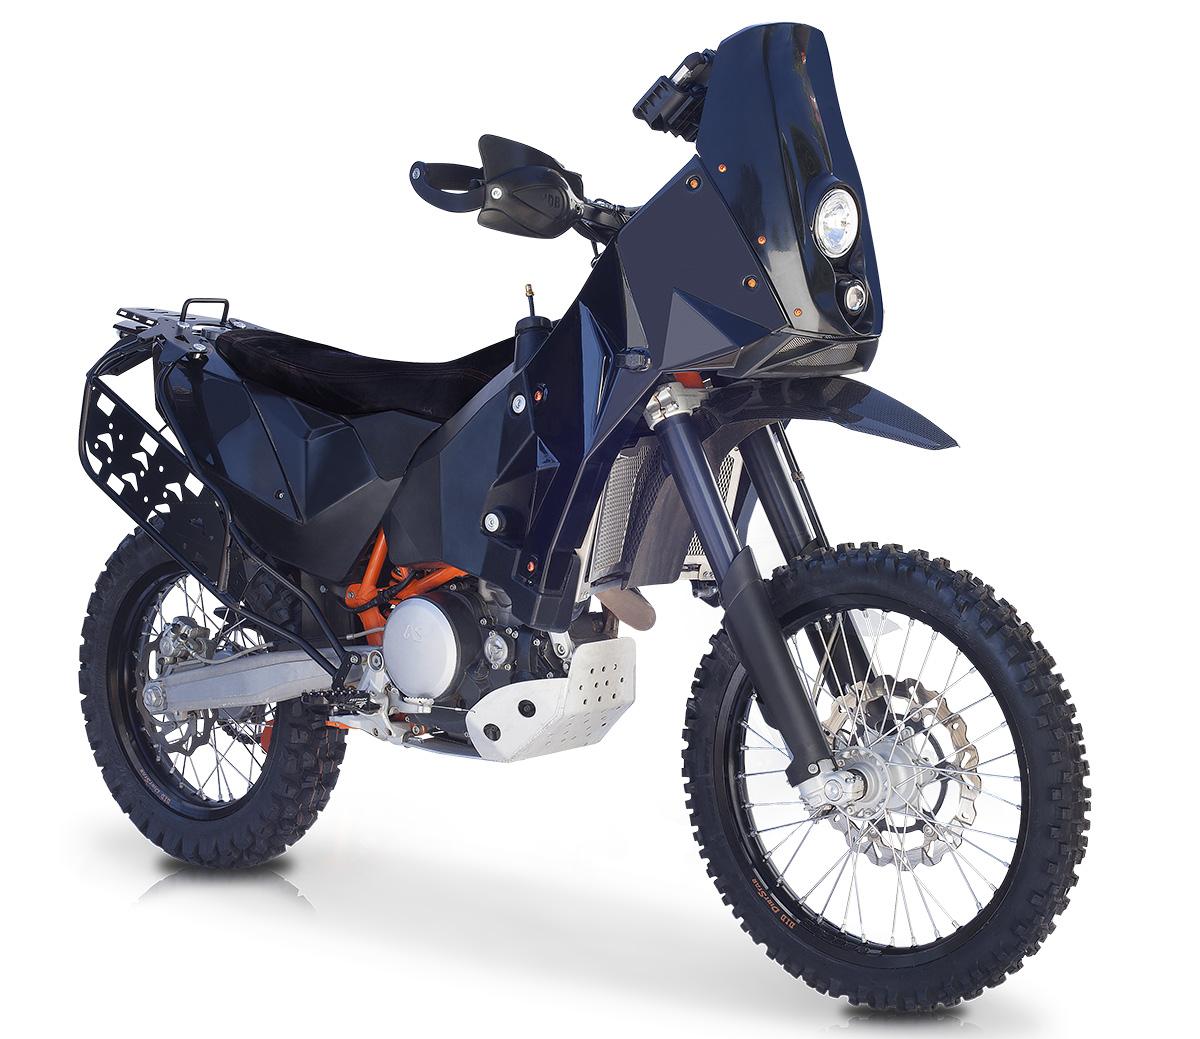 Ktm 690 Rally Build Adventure Rider Fuse Box Img